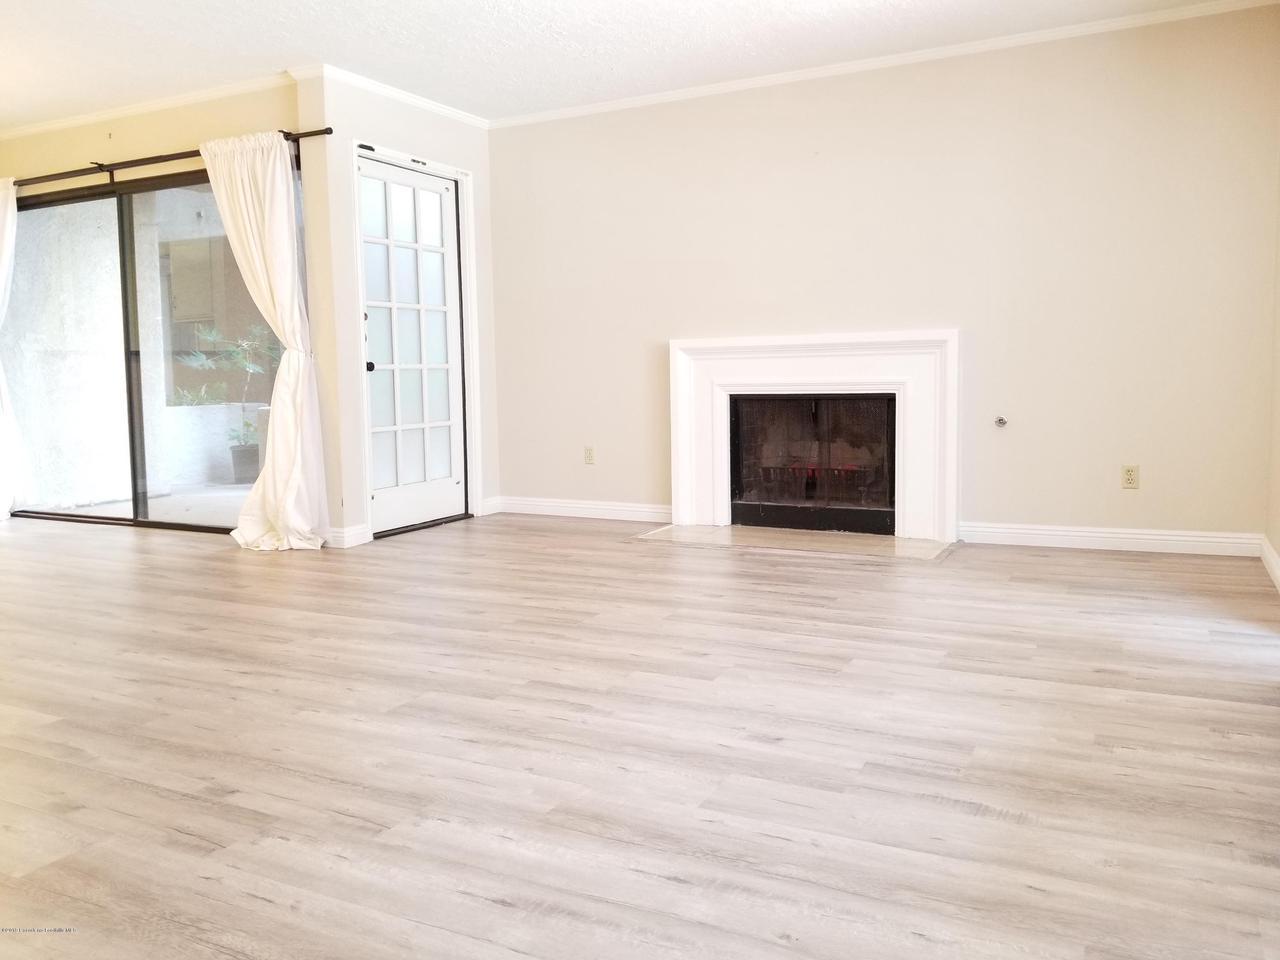 124 MONTEREY, South Pasadena, CA 91030 - Fireplace